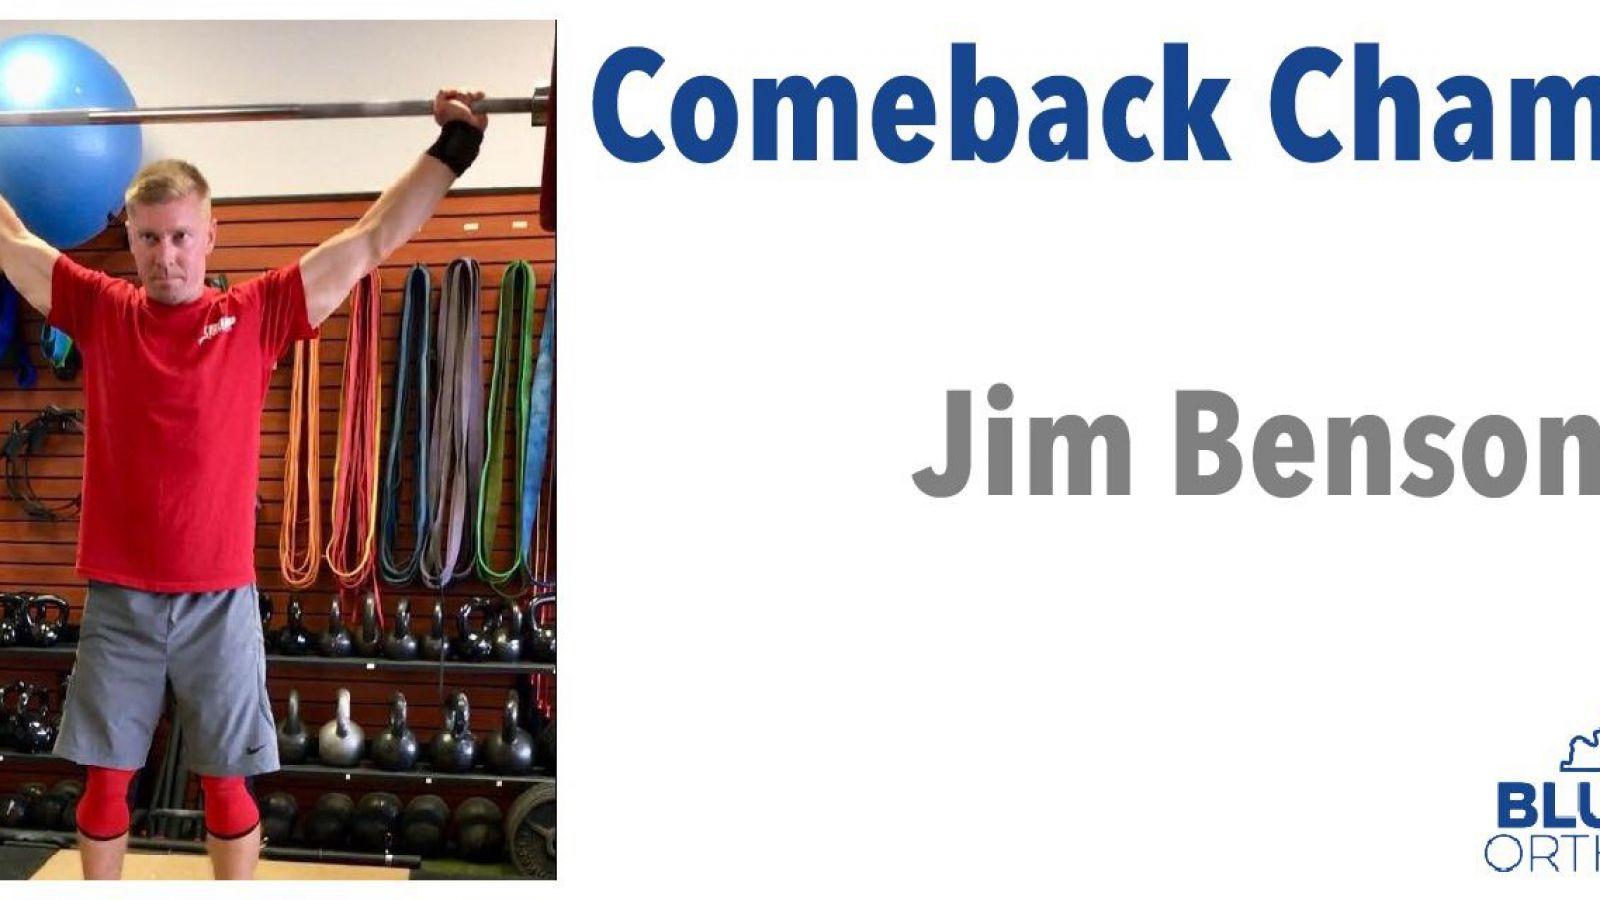 Jim Benson:  Comeback Champion of the Month